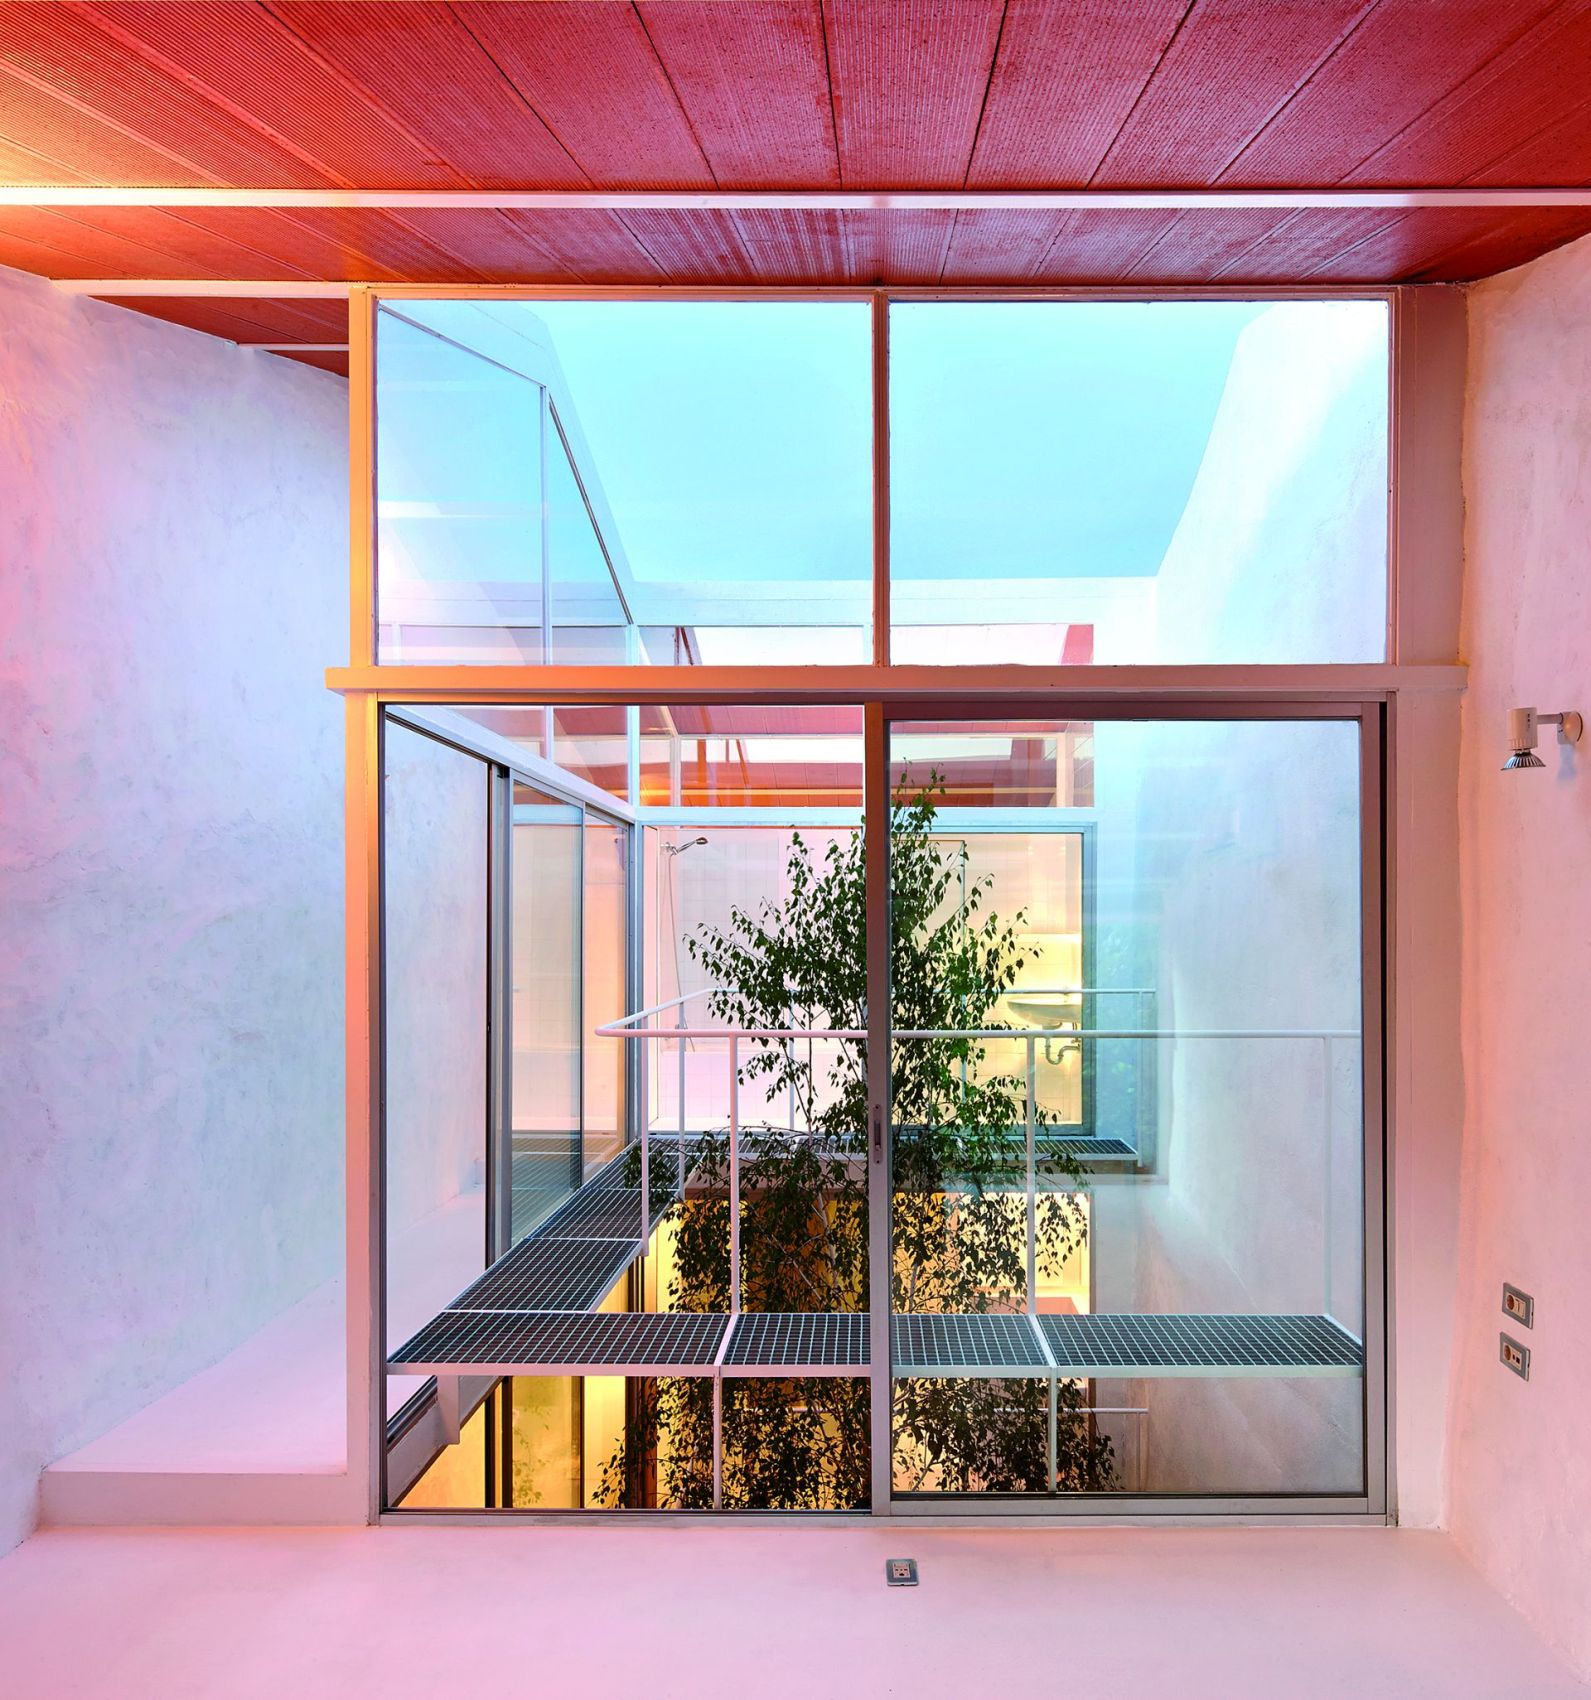 Luz House, Cilleros, Emerging Architects, fot. Jose Hevia (źródło: materiały prasowe organizatora)